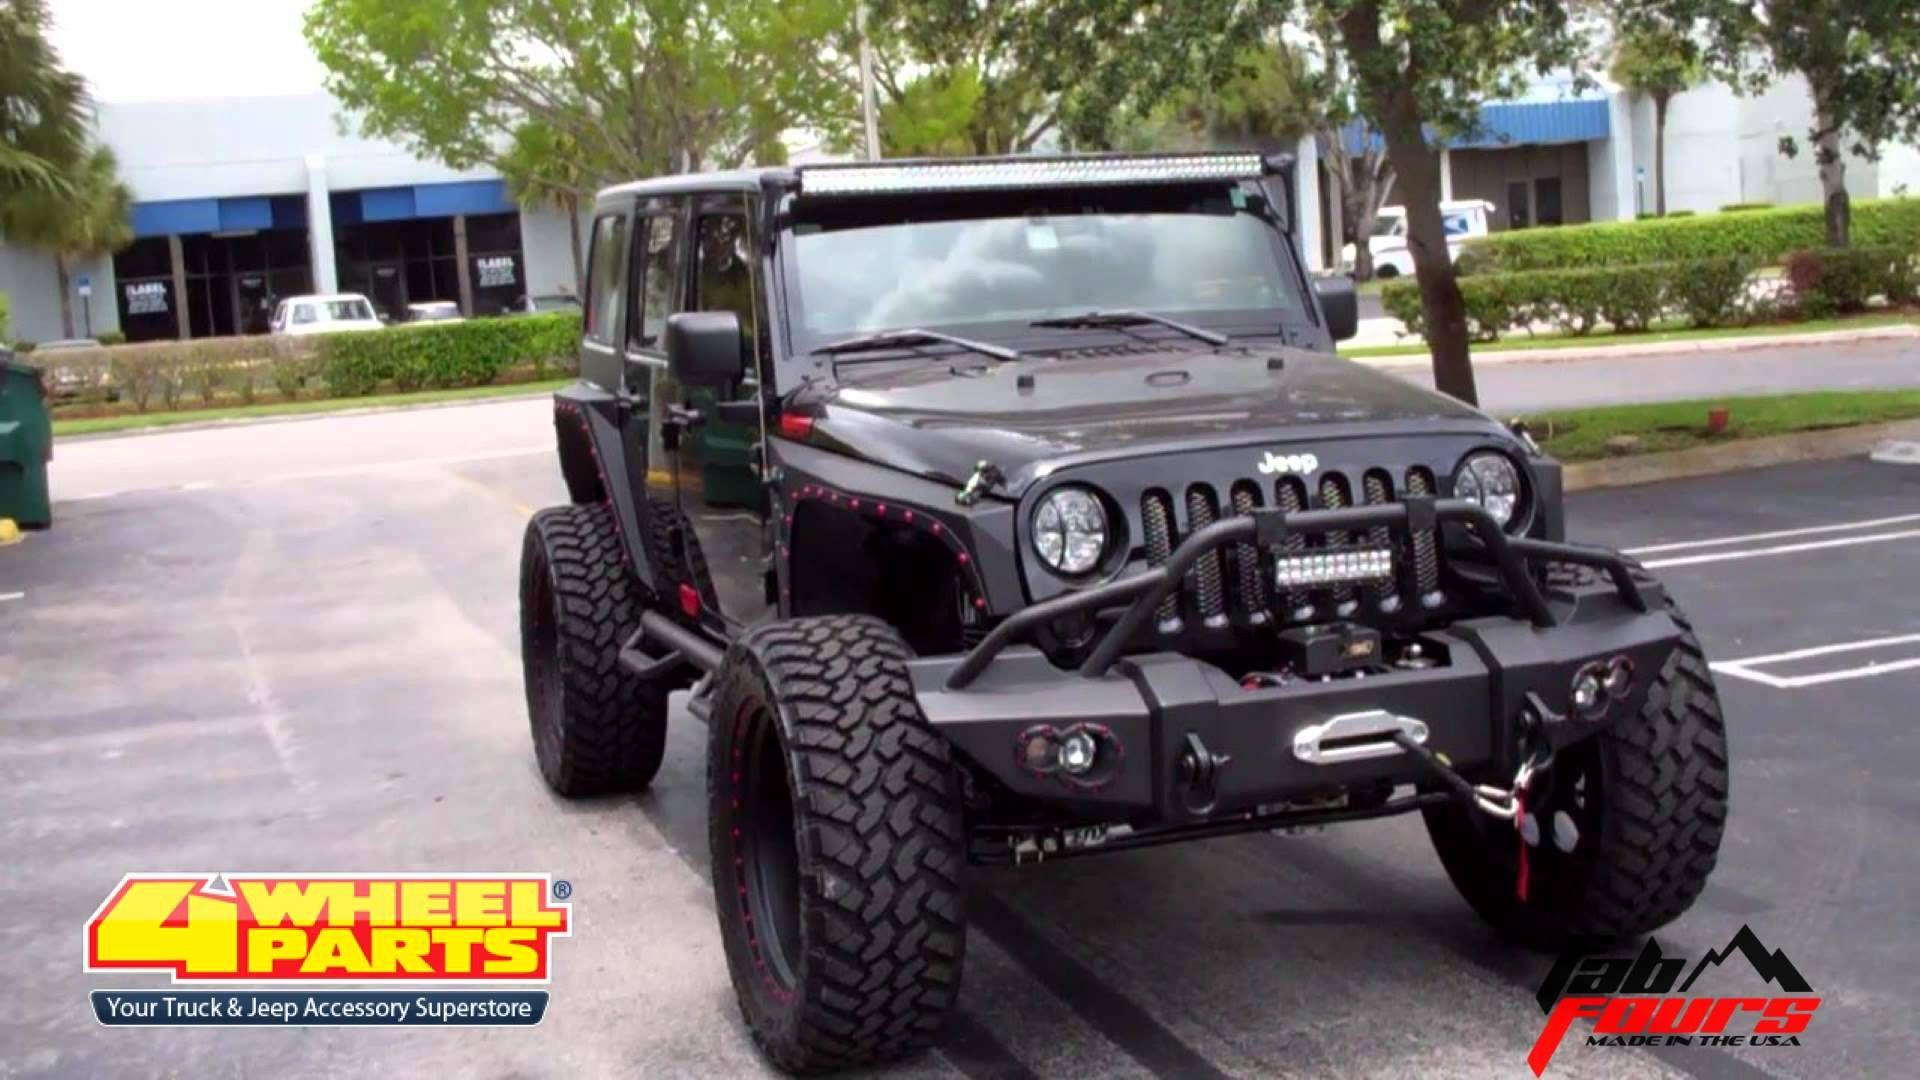 Jeep Jk Wrangler Parts Miami Fl 4 Wheel Parts Jeep Led Light Bar